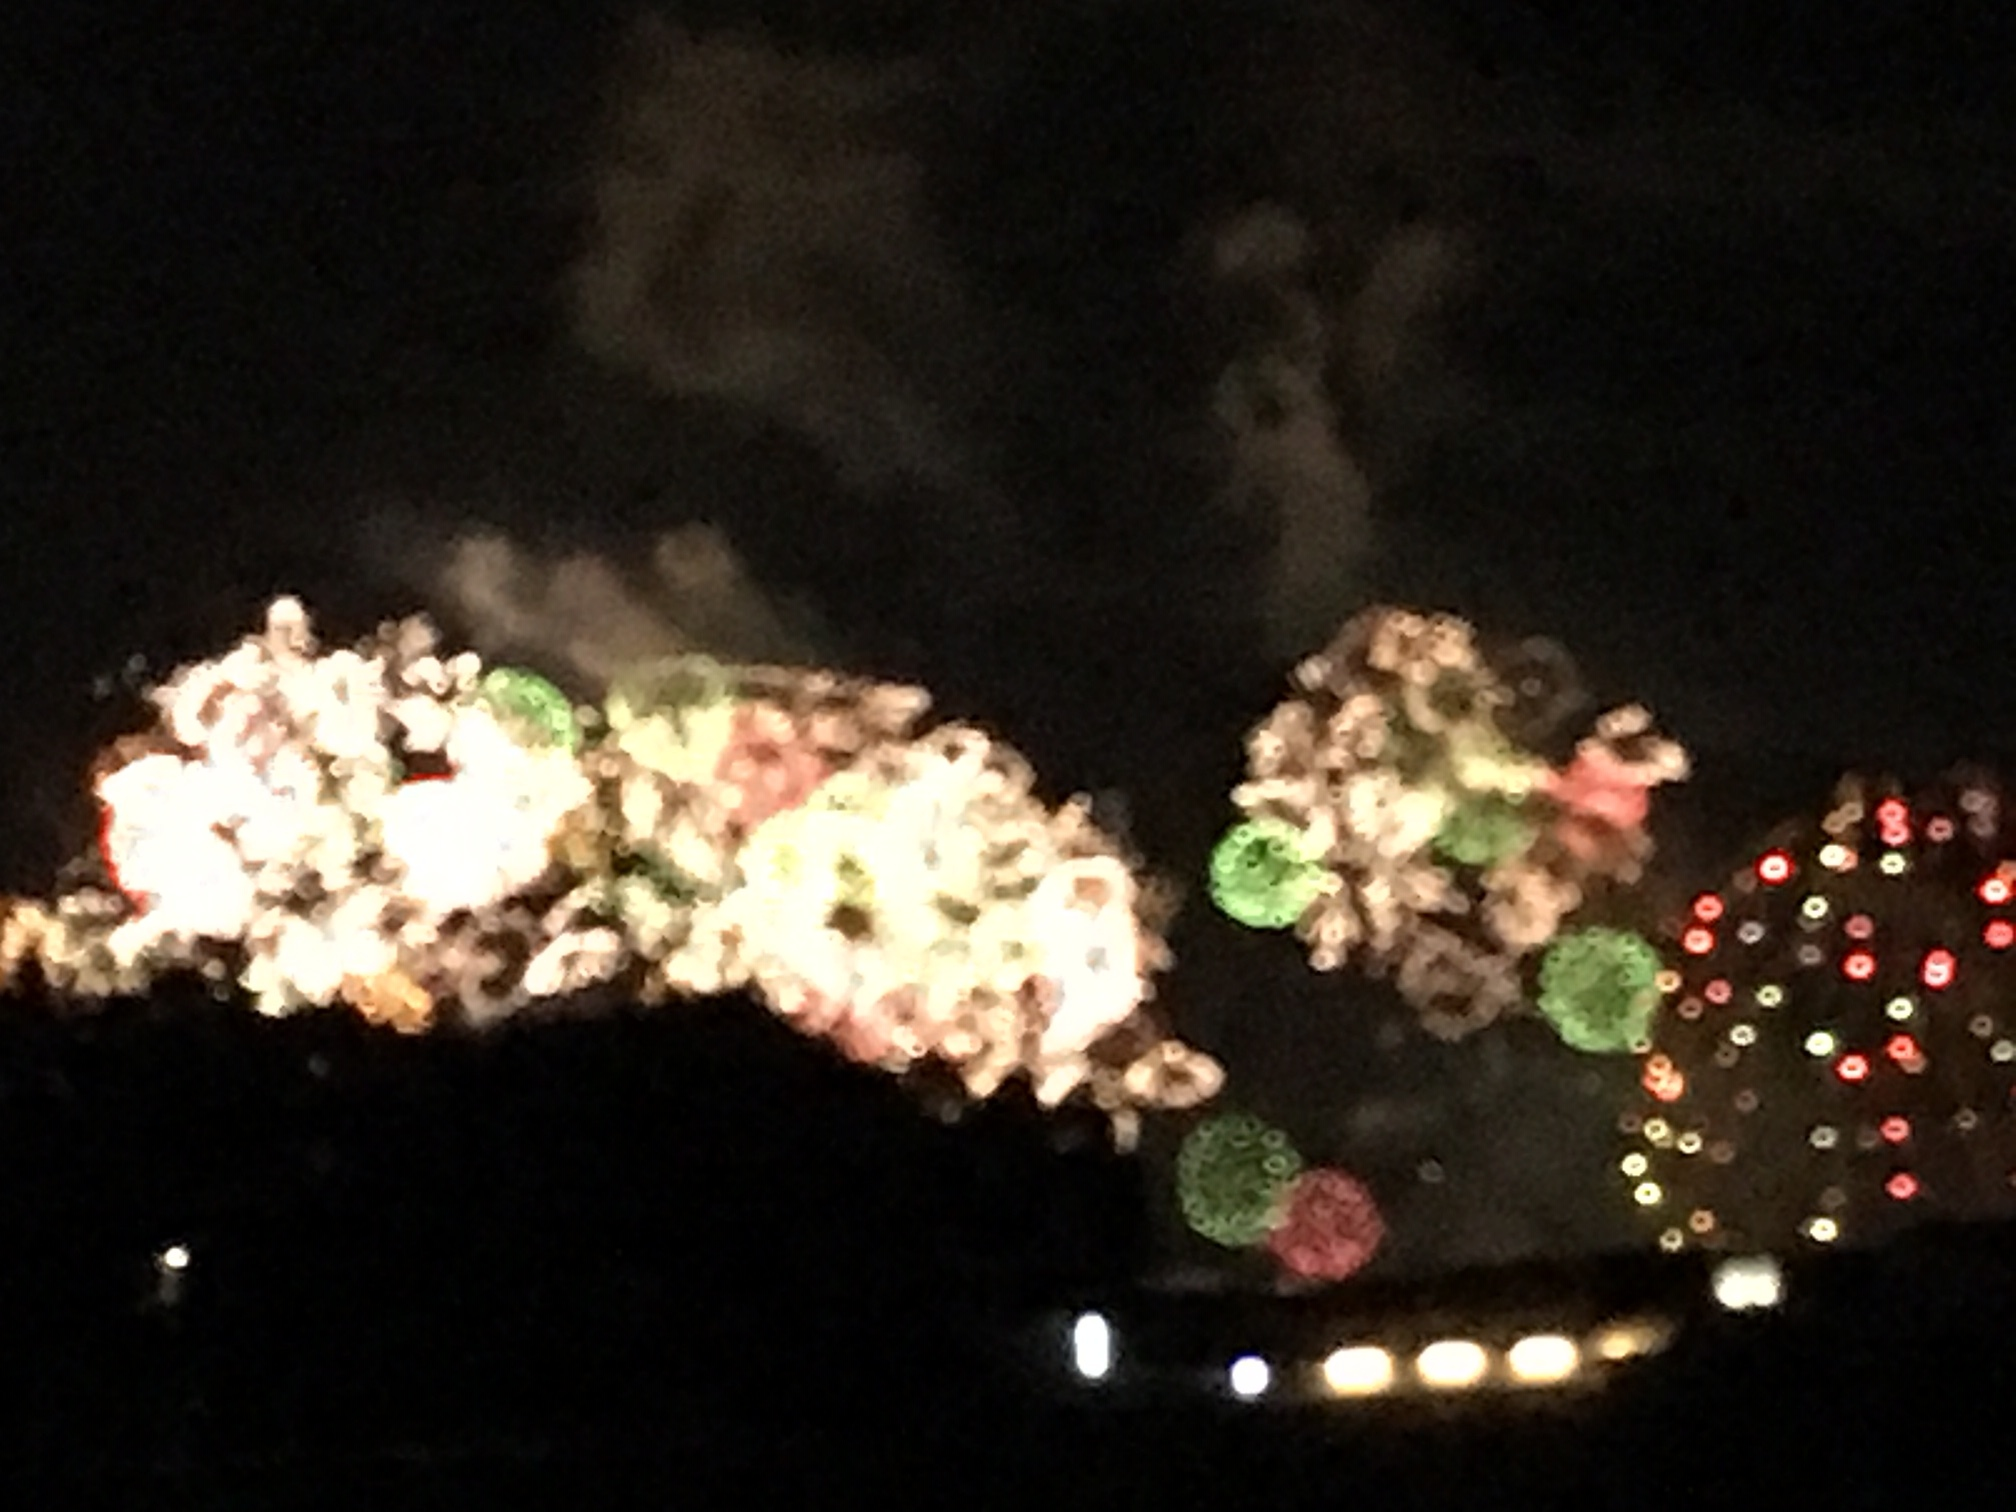 琵琶湖の花火_b0236472_22301611.jpeg